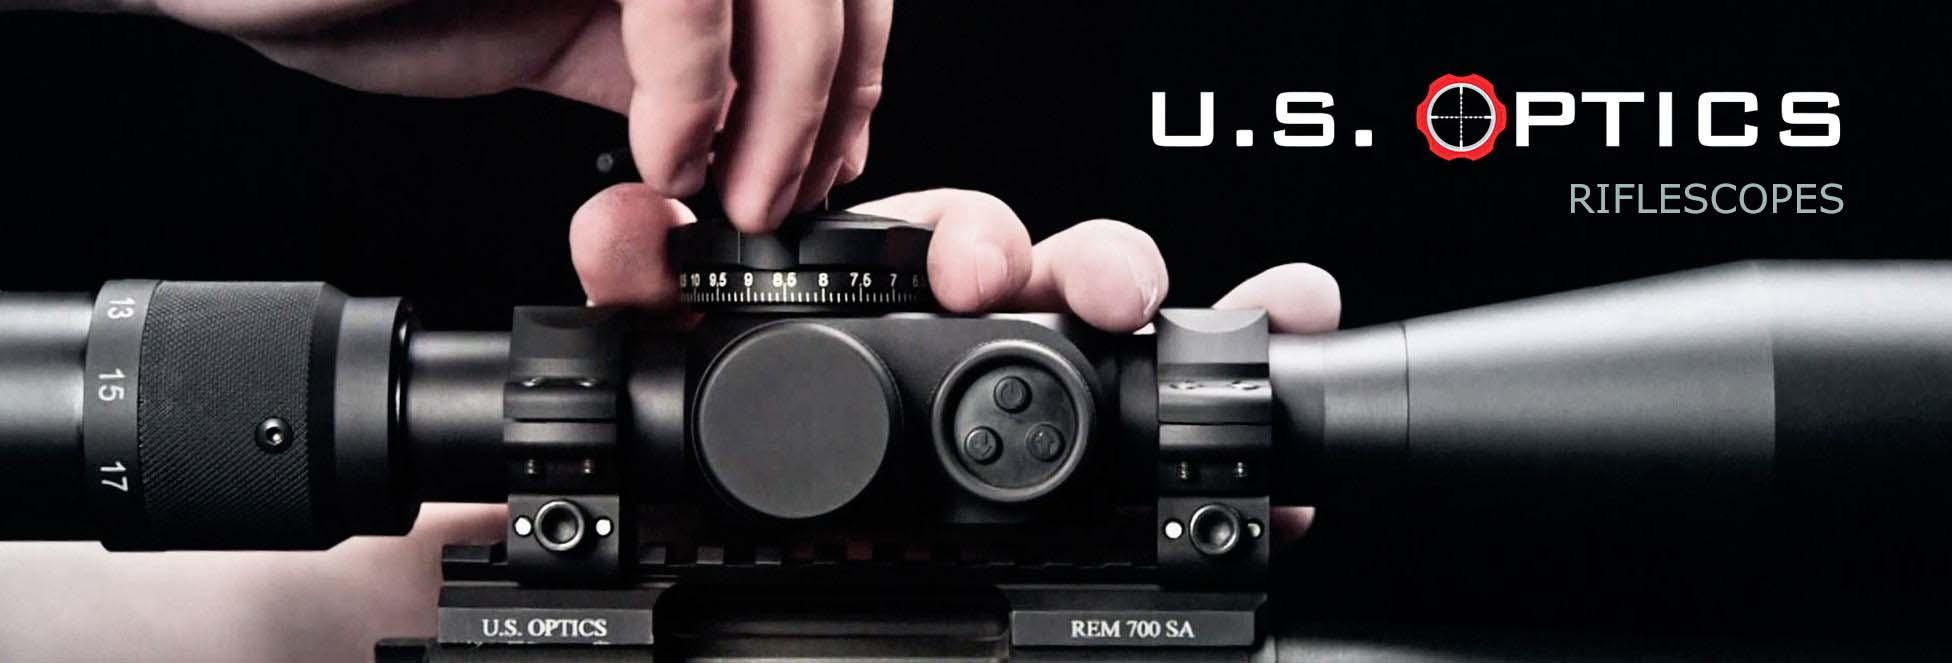 US Optics Products